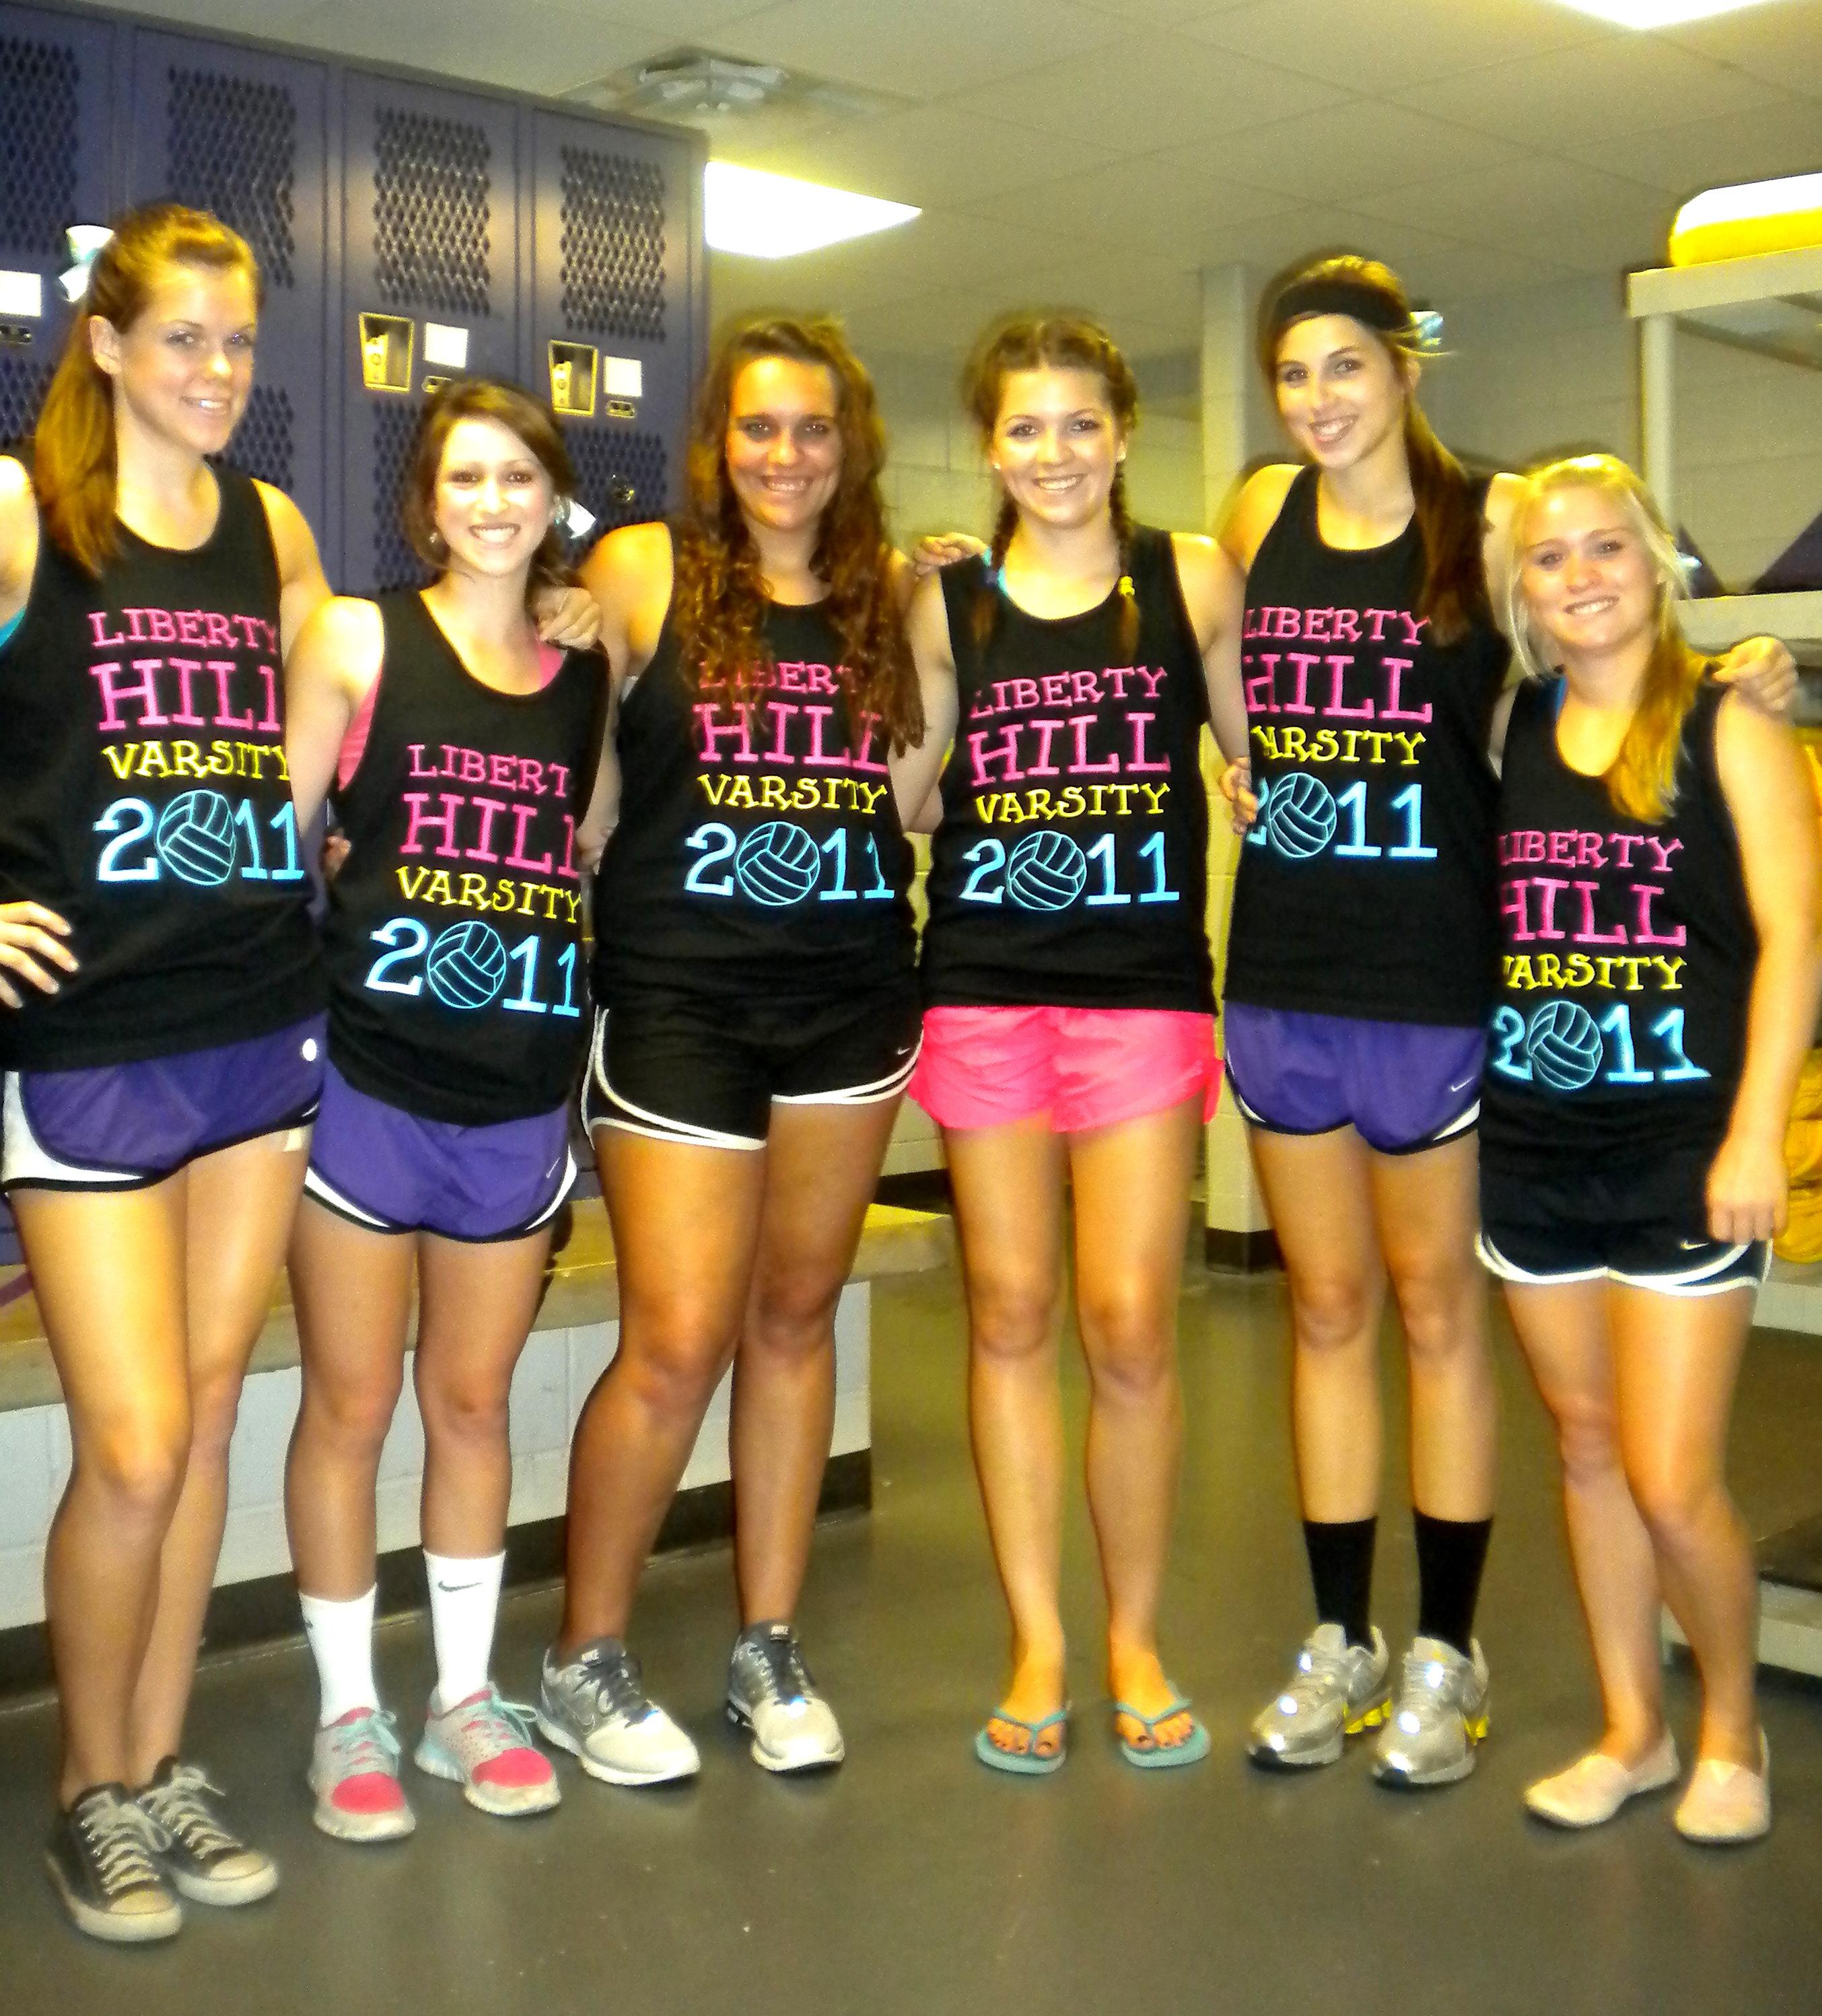 liberty hill lady panthers t shirt photo - Volleyball T Shirt Design Ideas